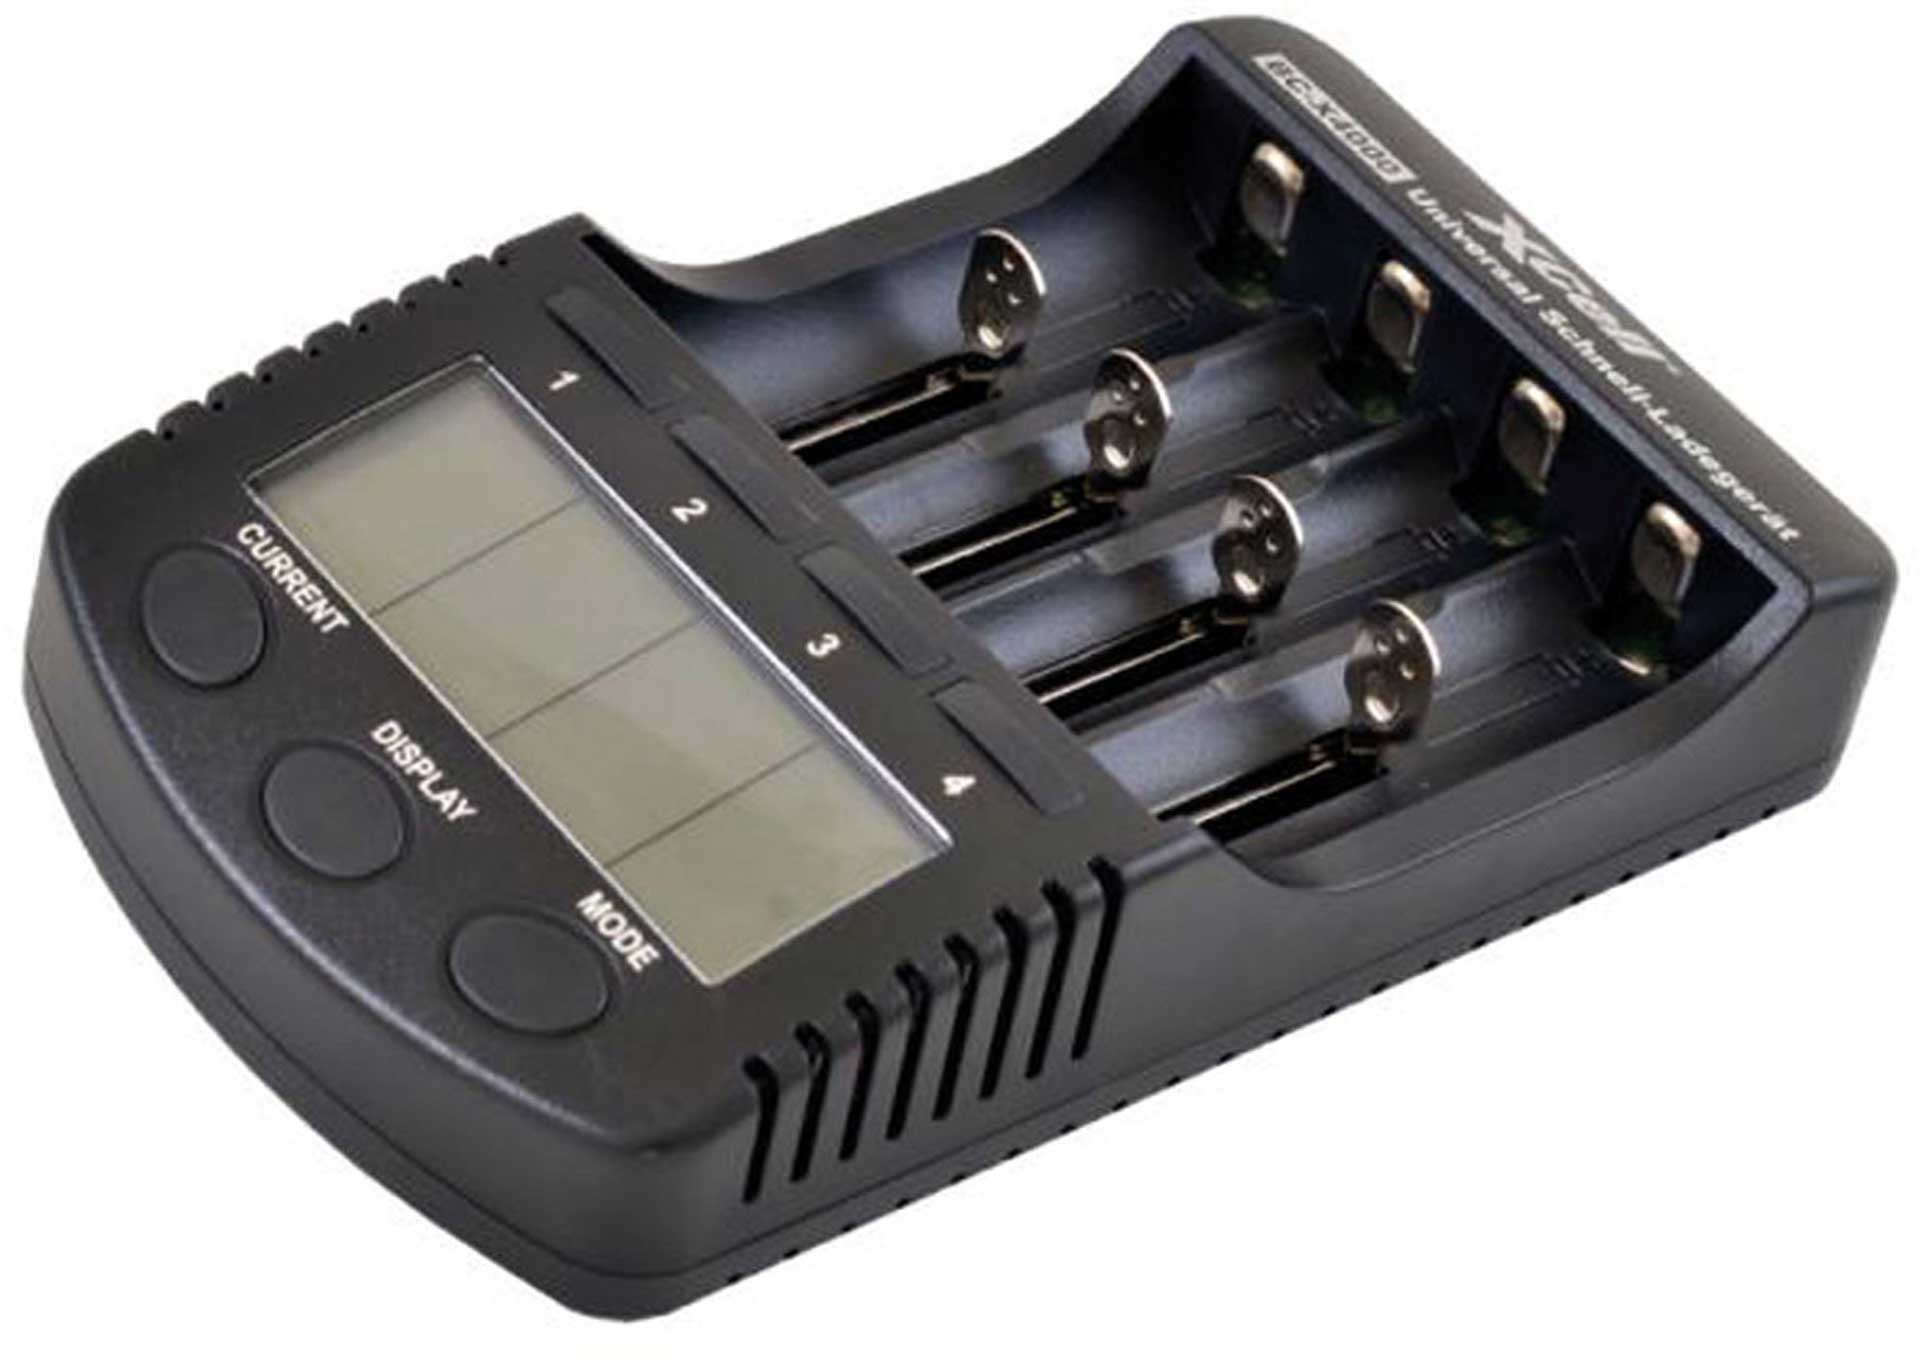 XCELL BC-X4000 SCHNELLADEGERÄT FÜR AA/AAA/C/SC